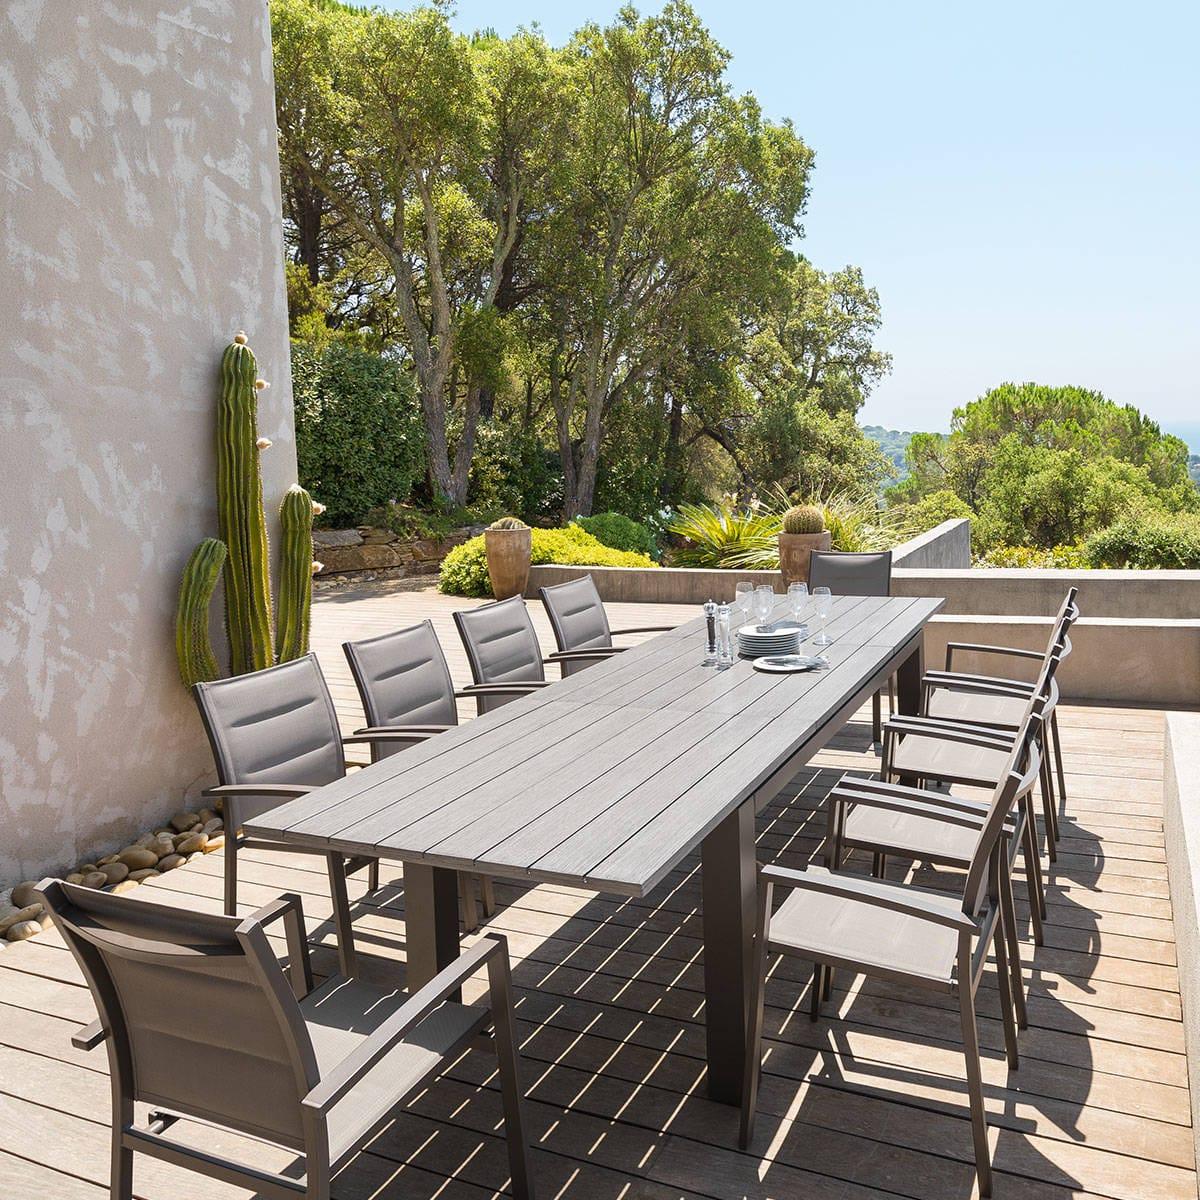 Table De Jardin Modulable – Nieuwste Woninginrichting encequiconcerne Brico Depot Salon De Jardin